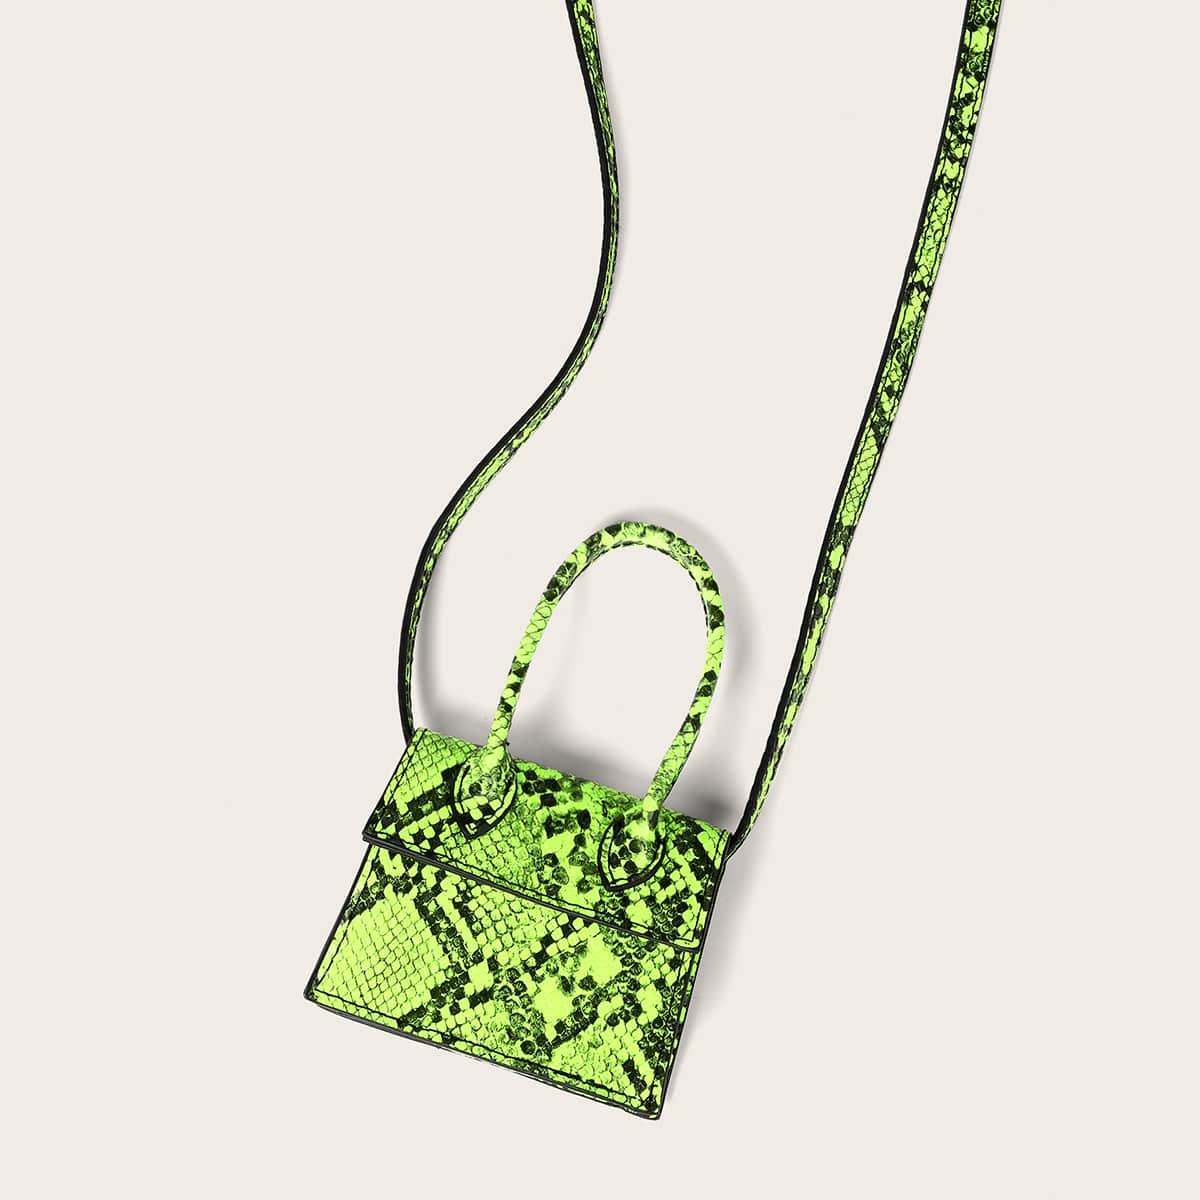 SHEIN / Mini Neon Lime Snakeskin Print Satchel Bag